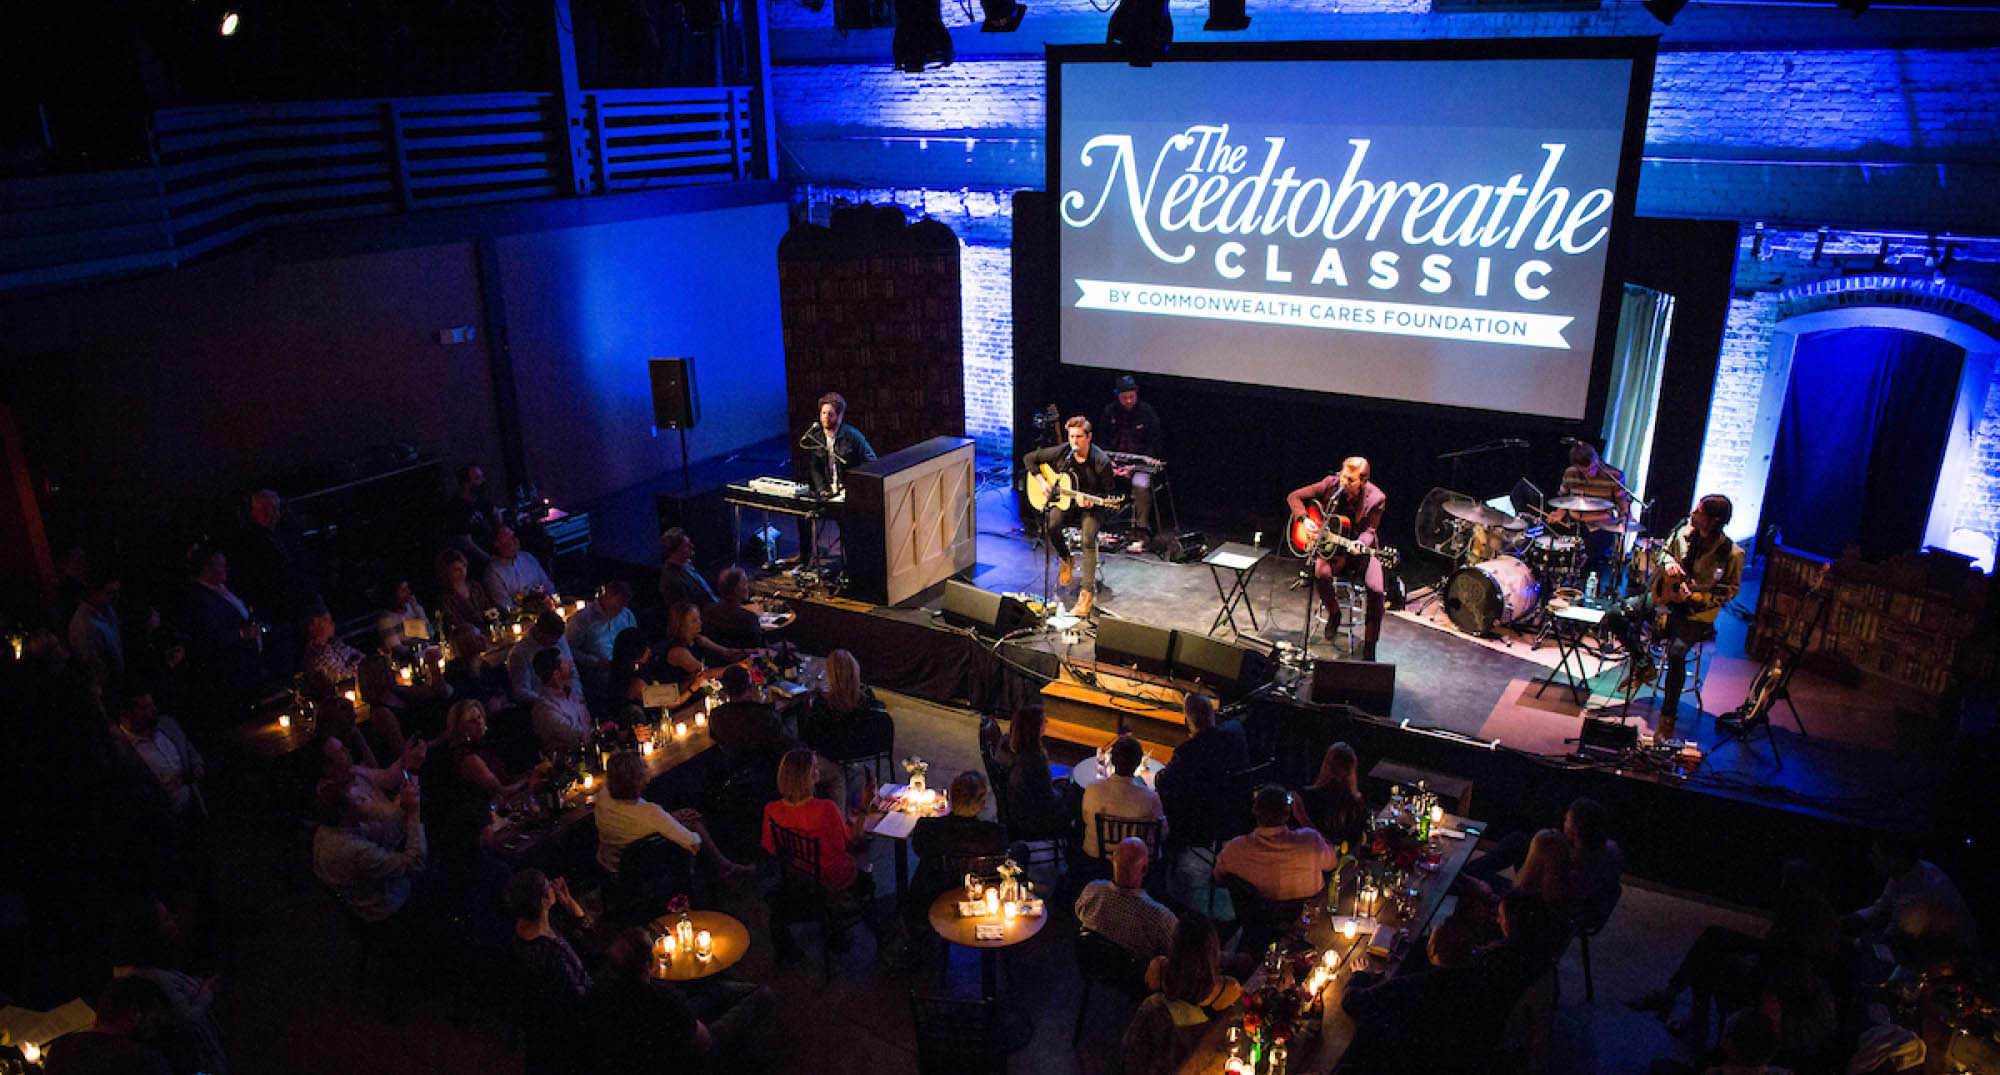 Needtobreathe Classic Concert